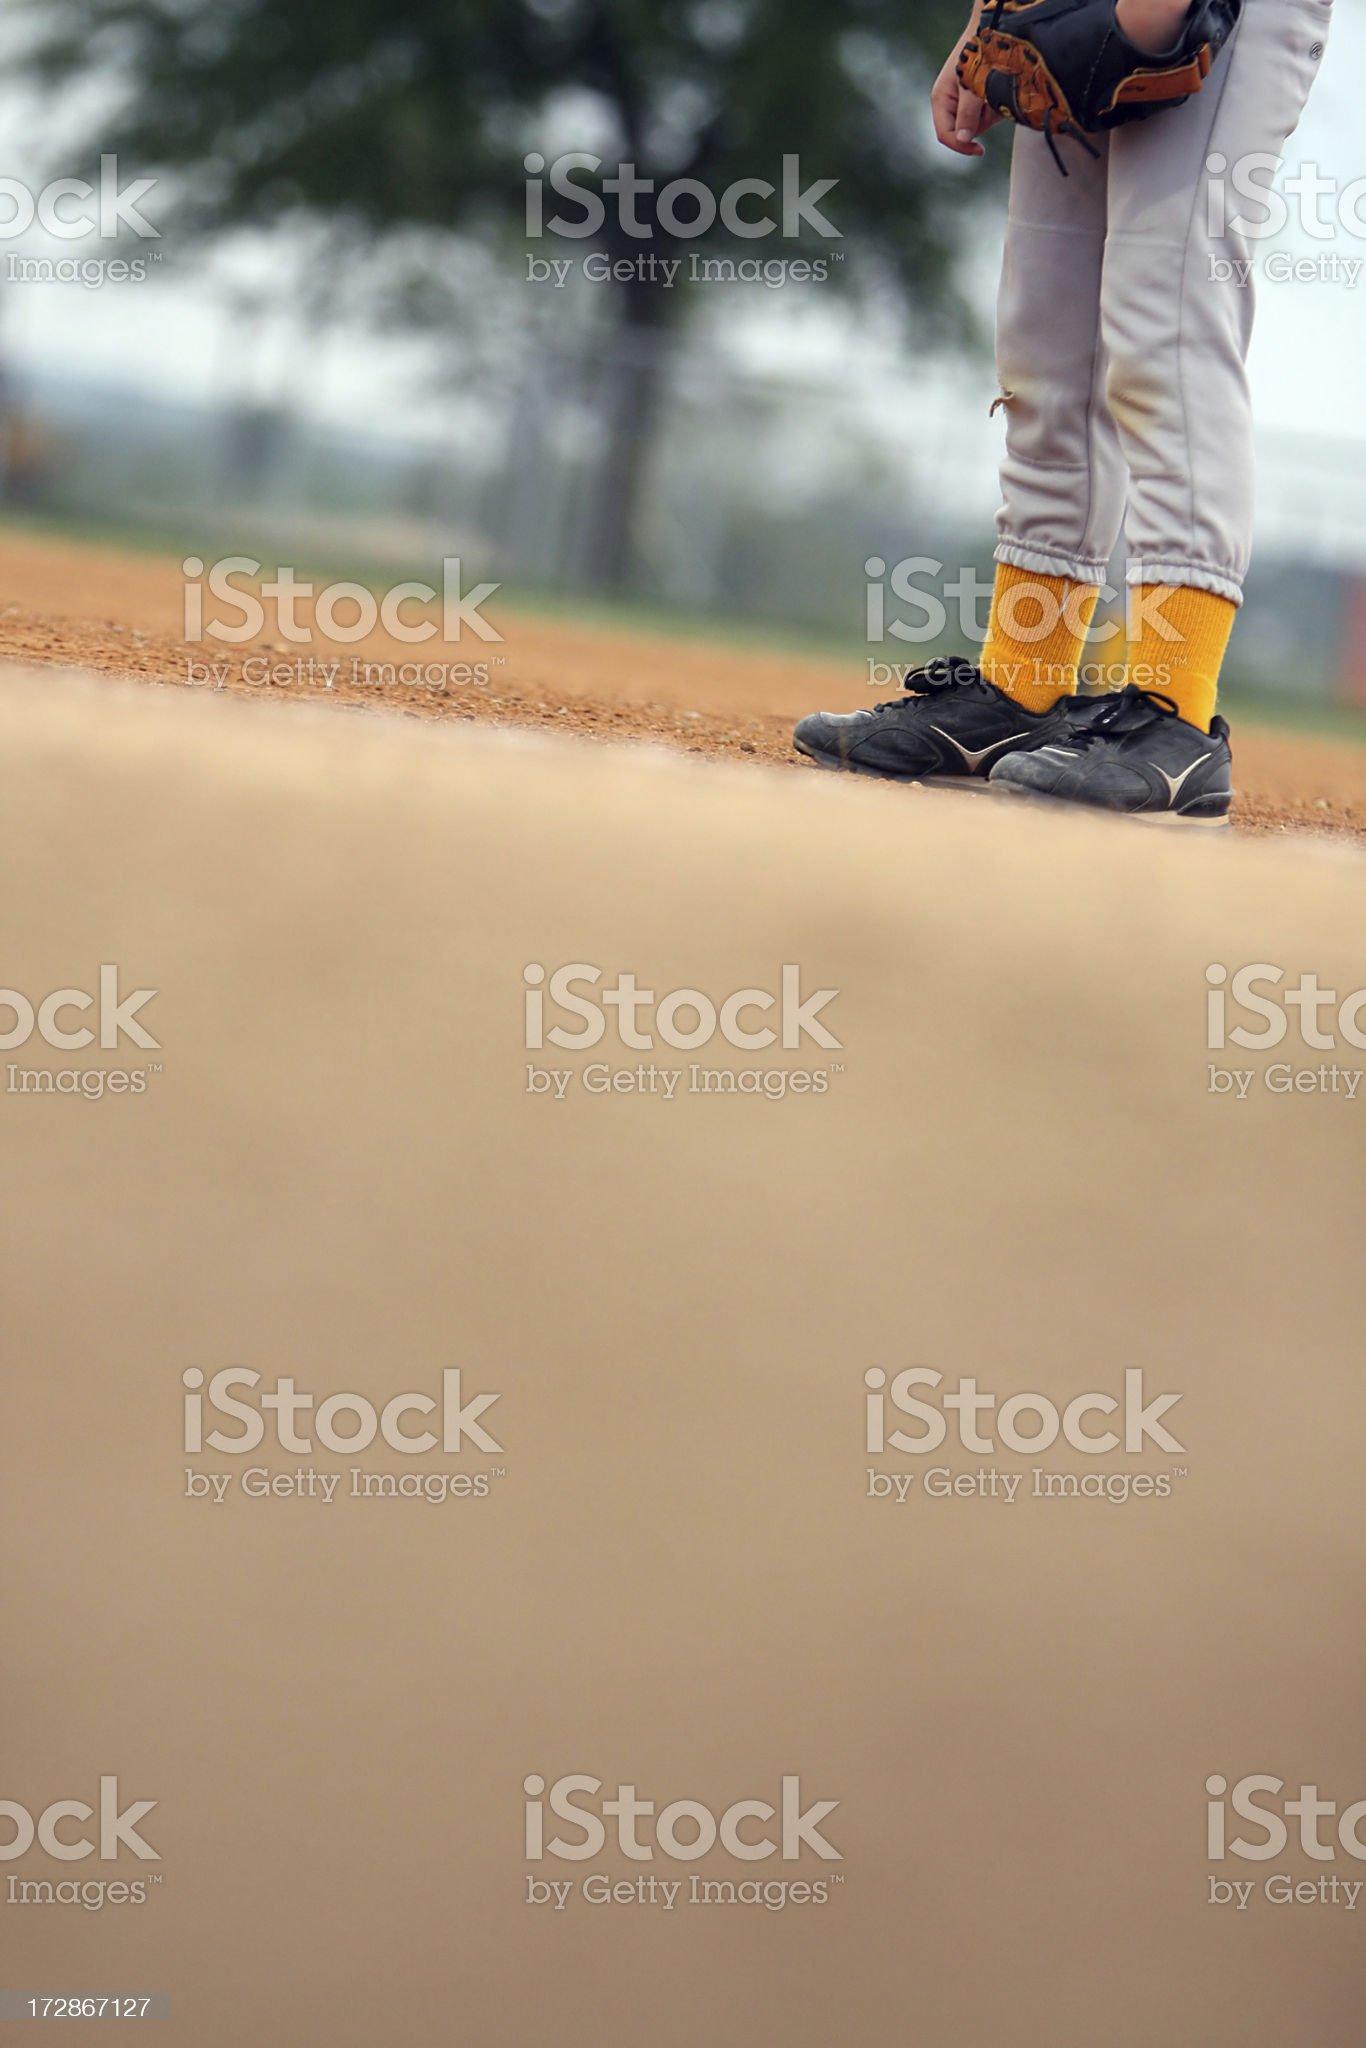 Baseball Player Abstract royalty-free stock photo